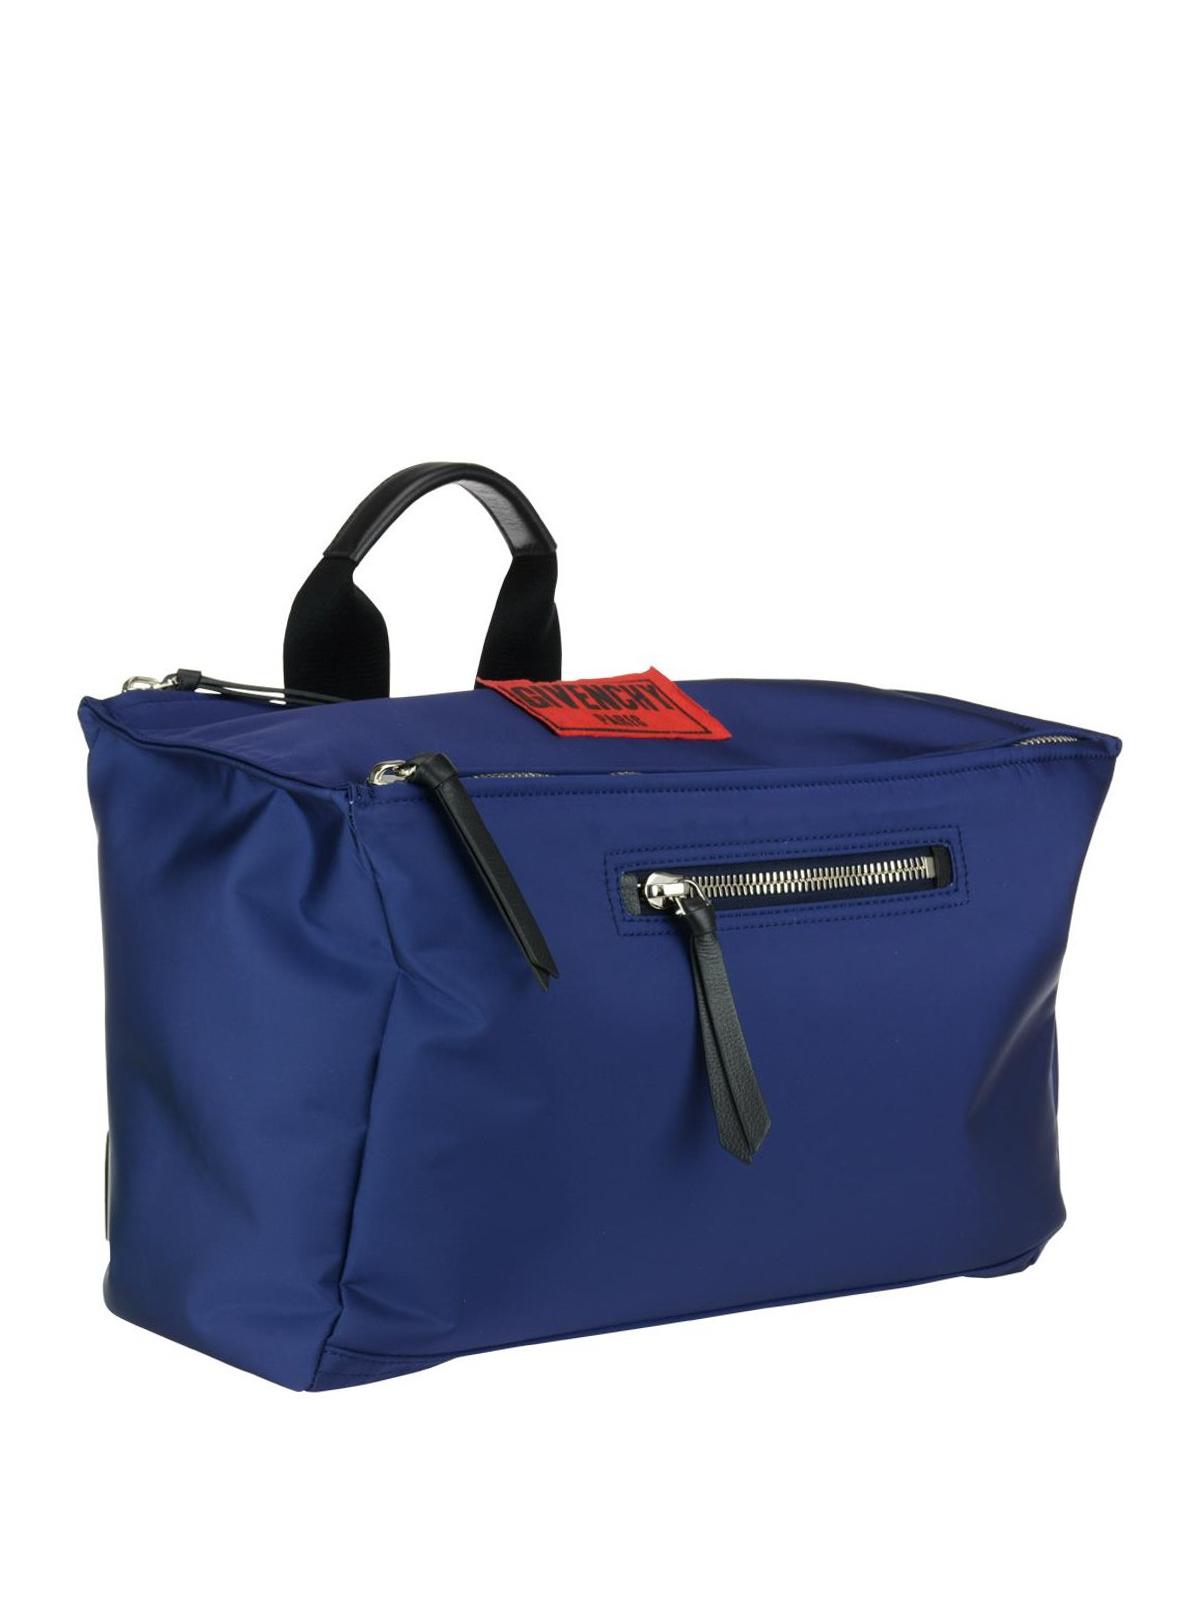 Givenchy Pandora techno fabric messenger bag sk1NjQG0Sn